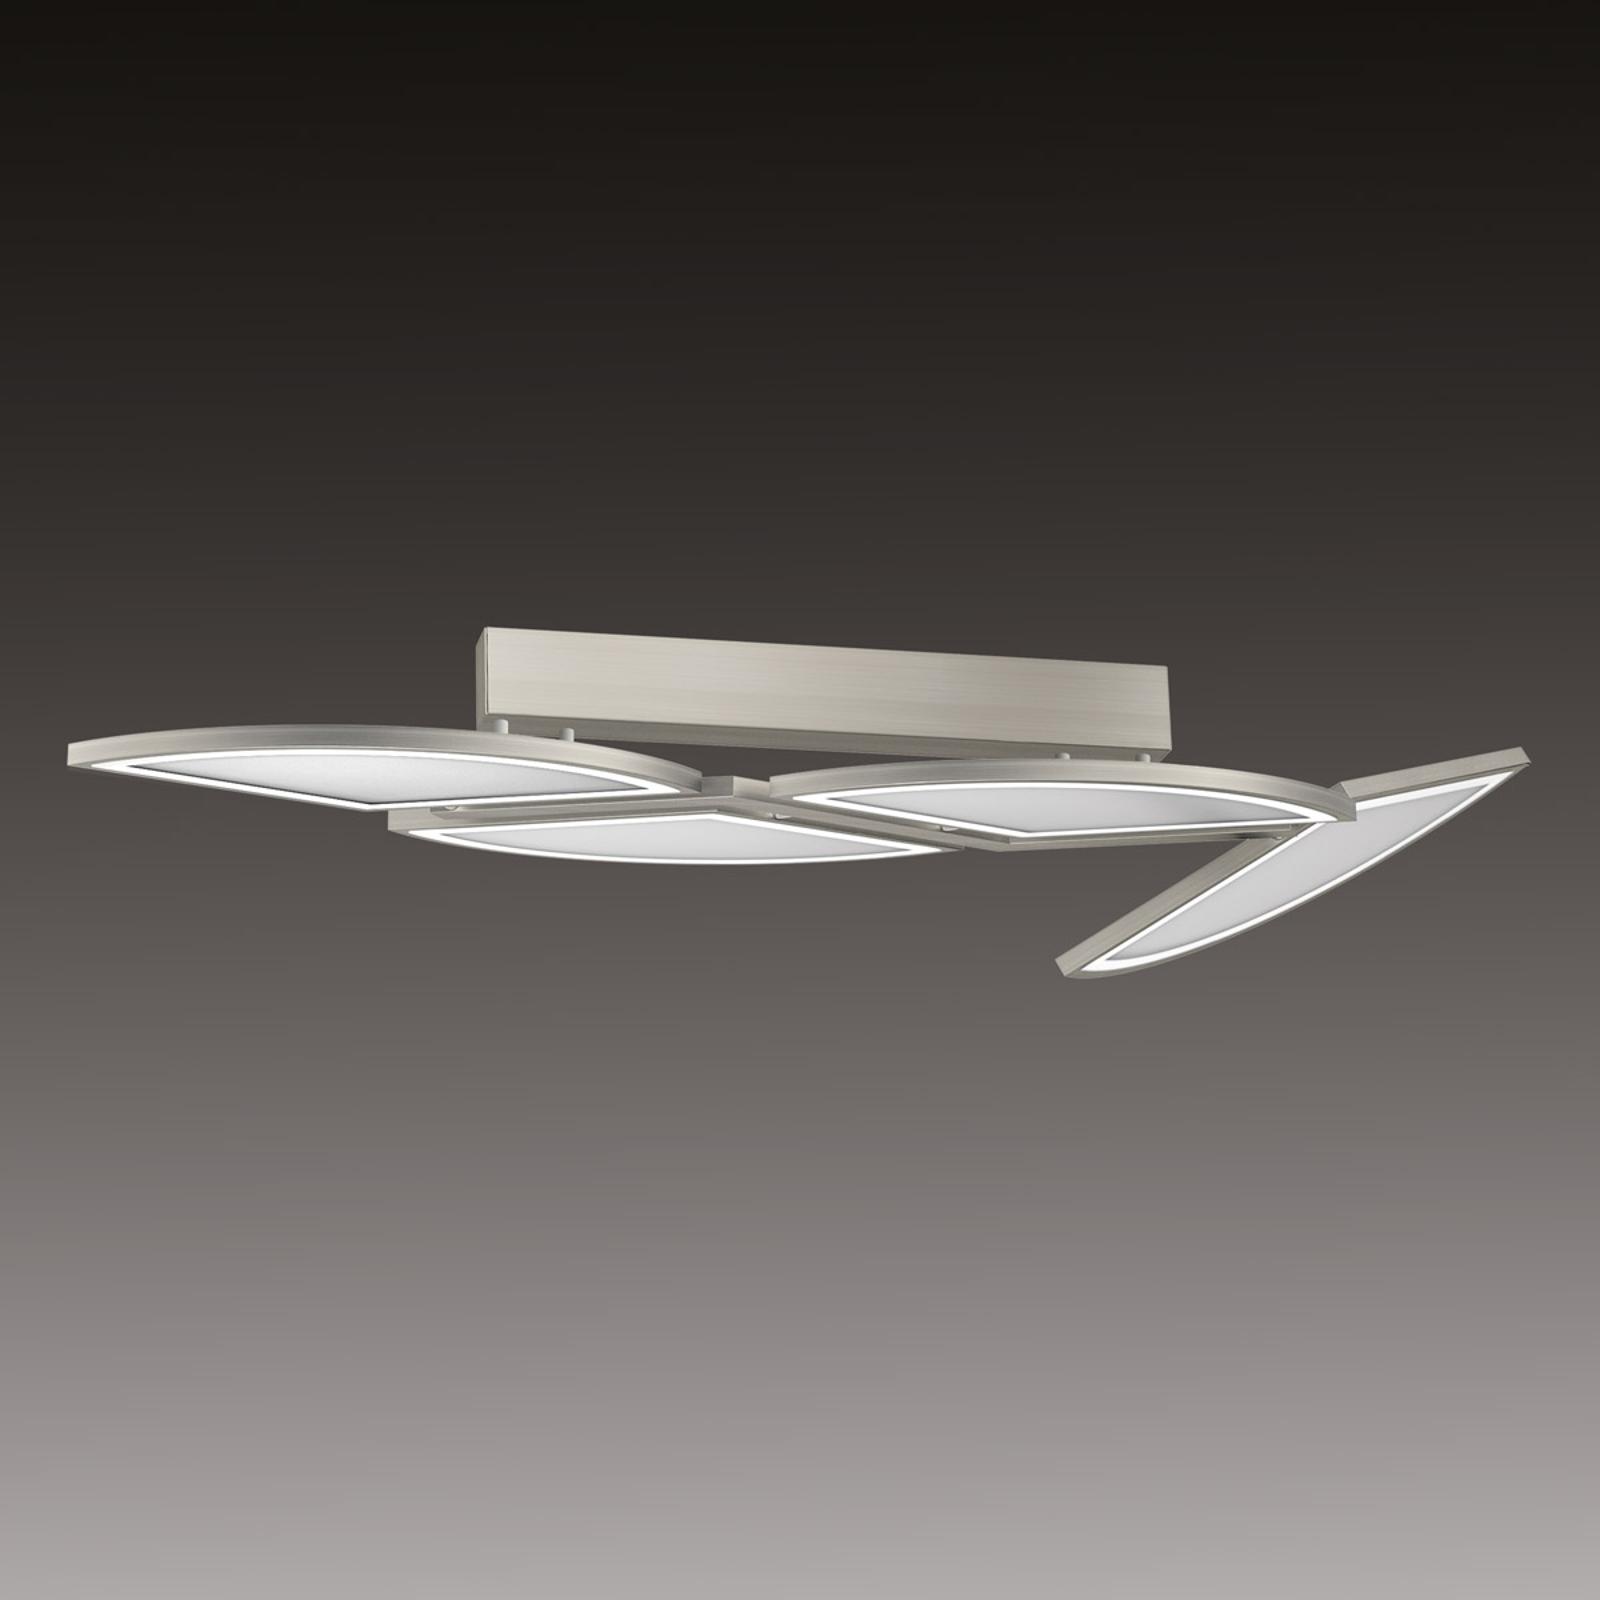 Movil - LED-taklampa med 4 ljussegment